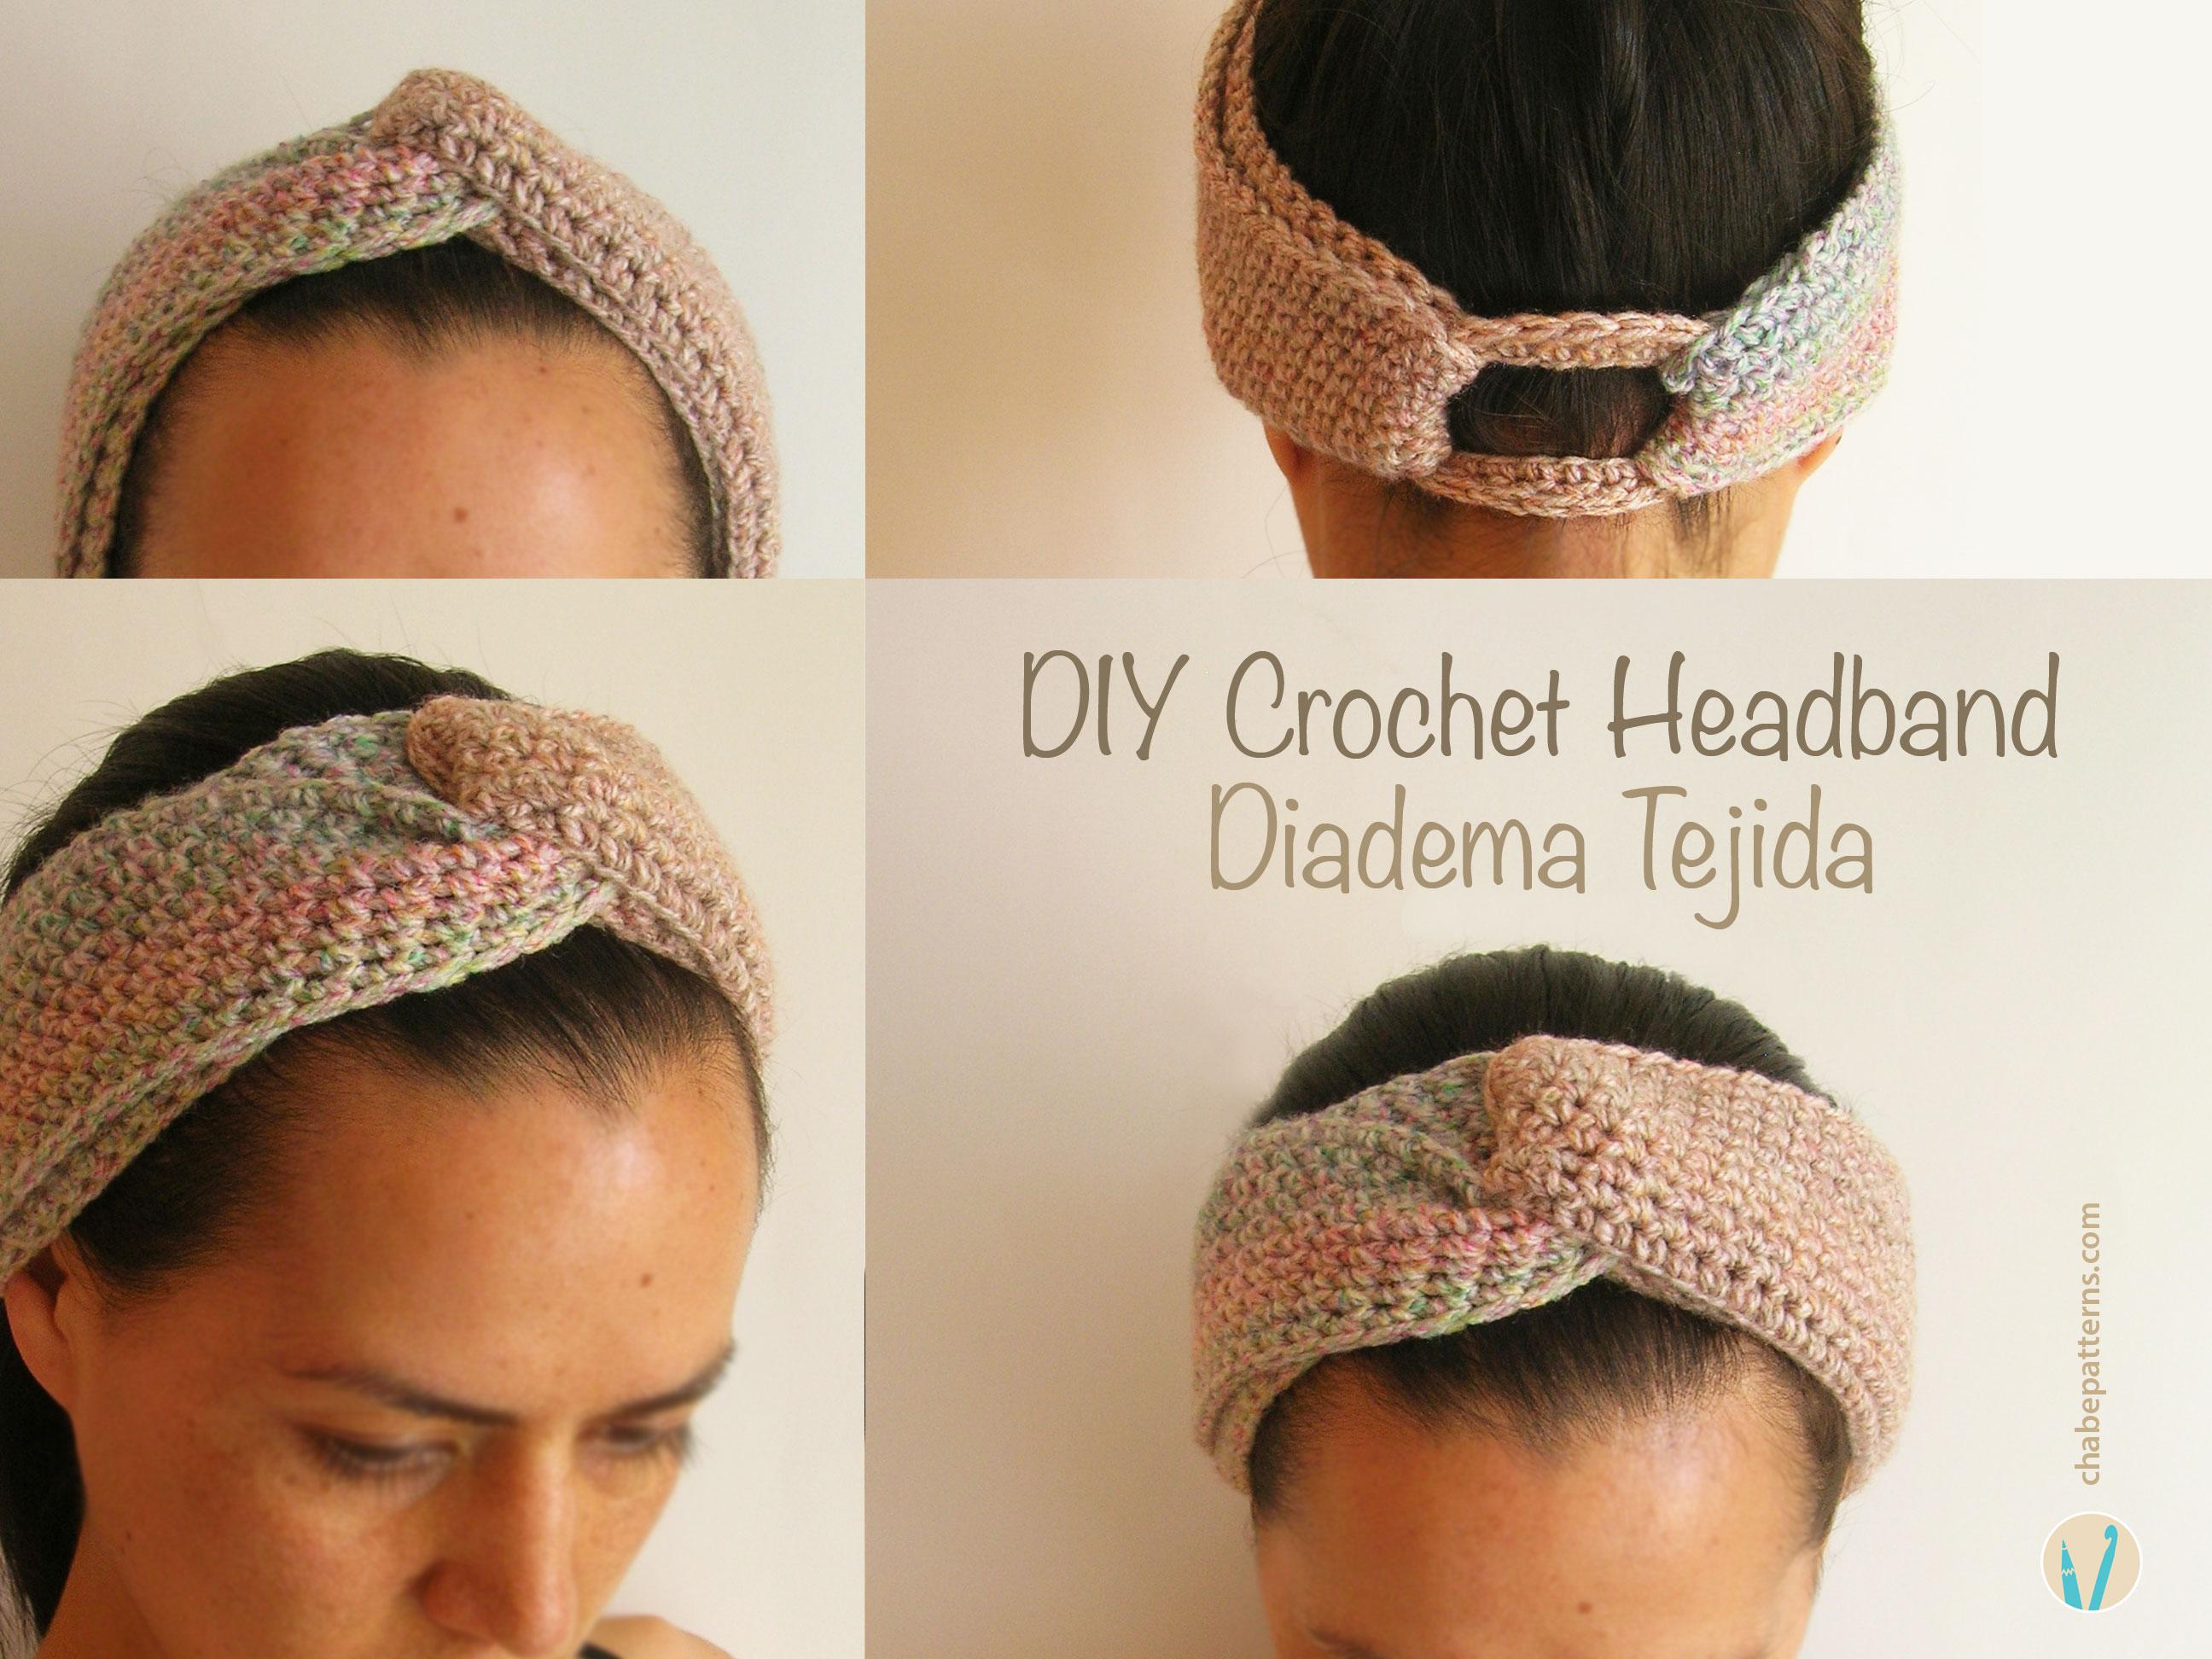 Crochet headband diadema tejida - Diademas de ganchillo ...